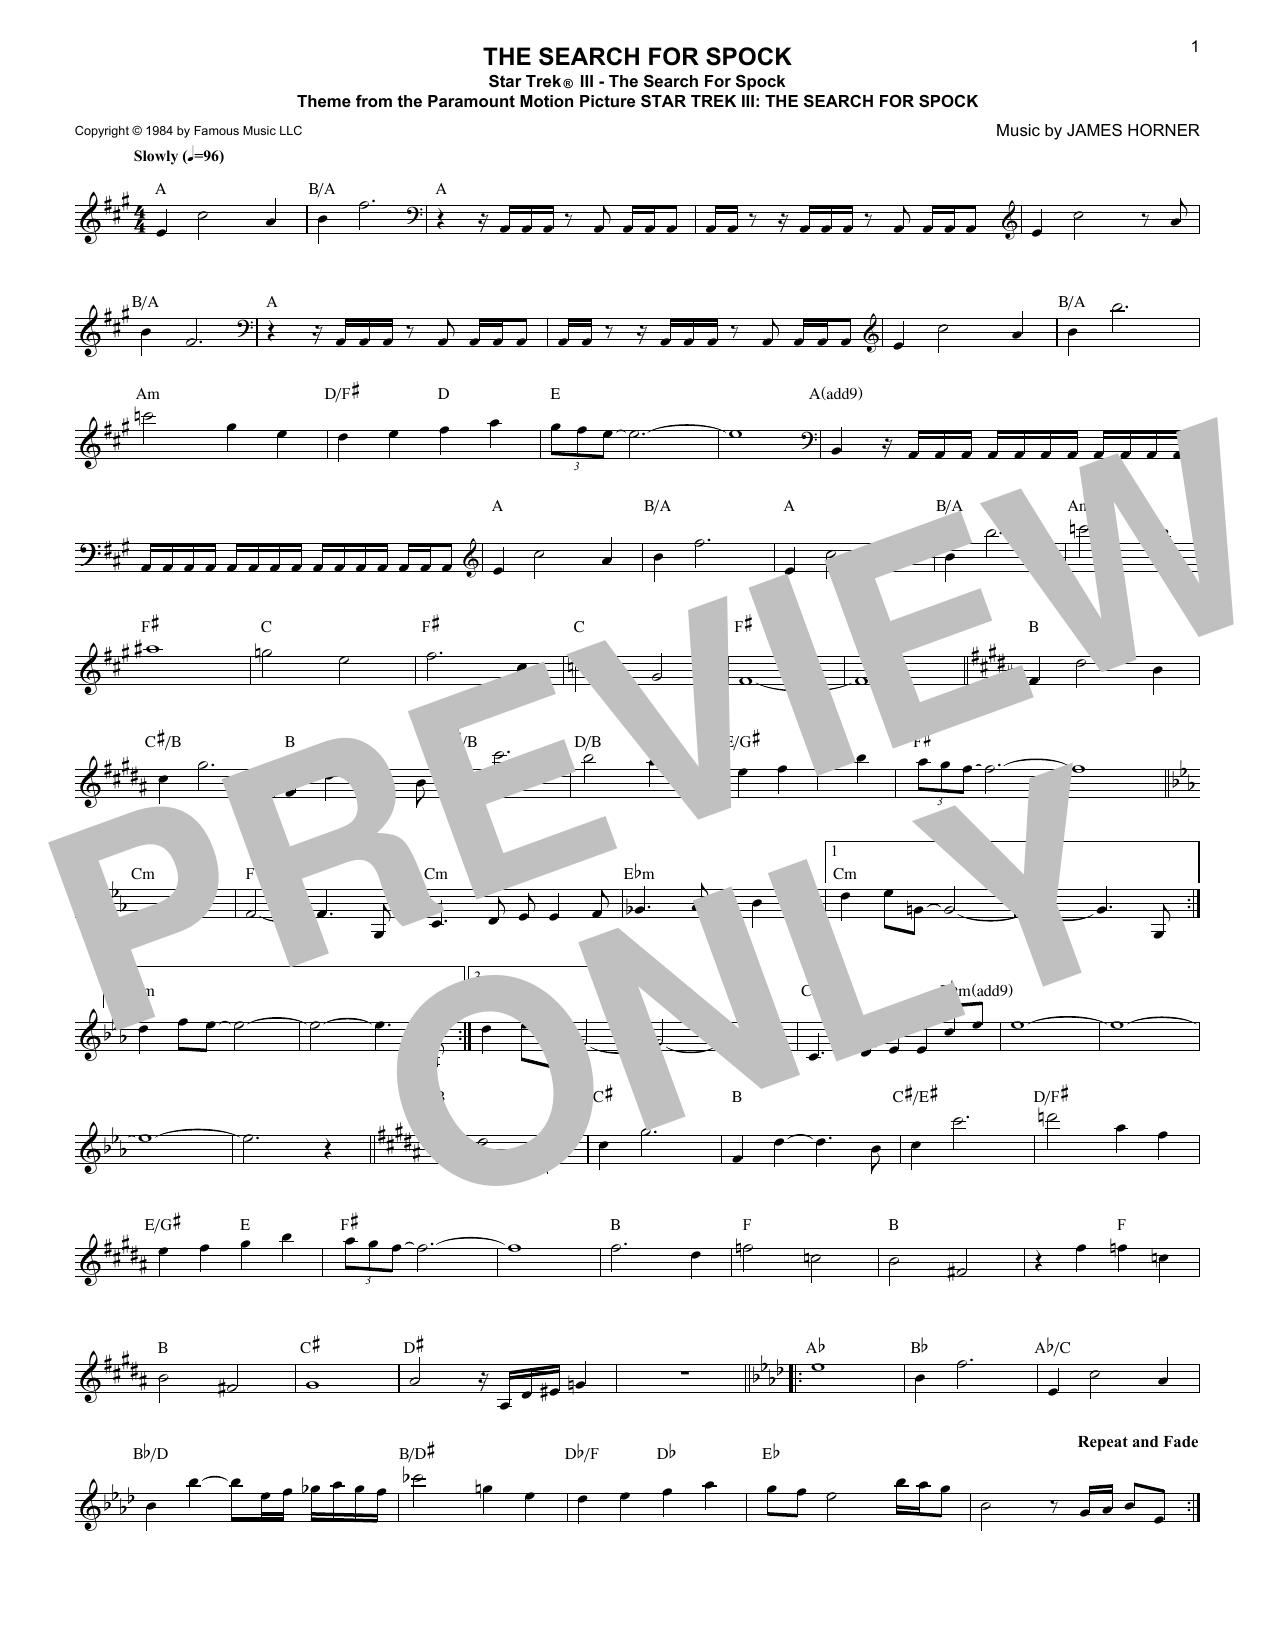 James Horner Star Trek(R) III - The Search For Spock sheet music notes printable PDF score